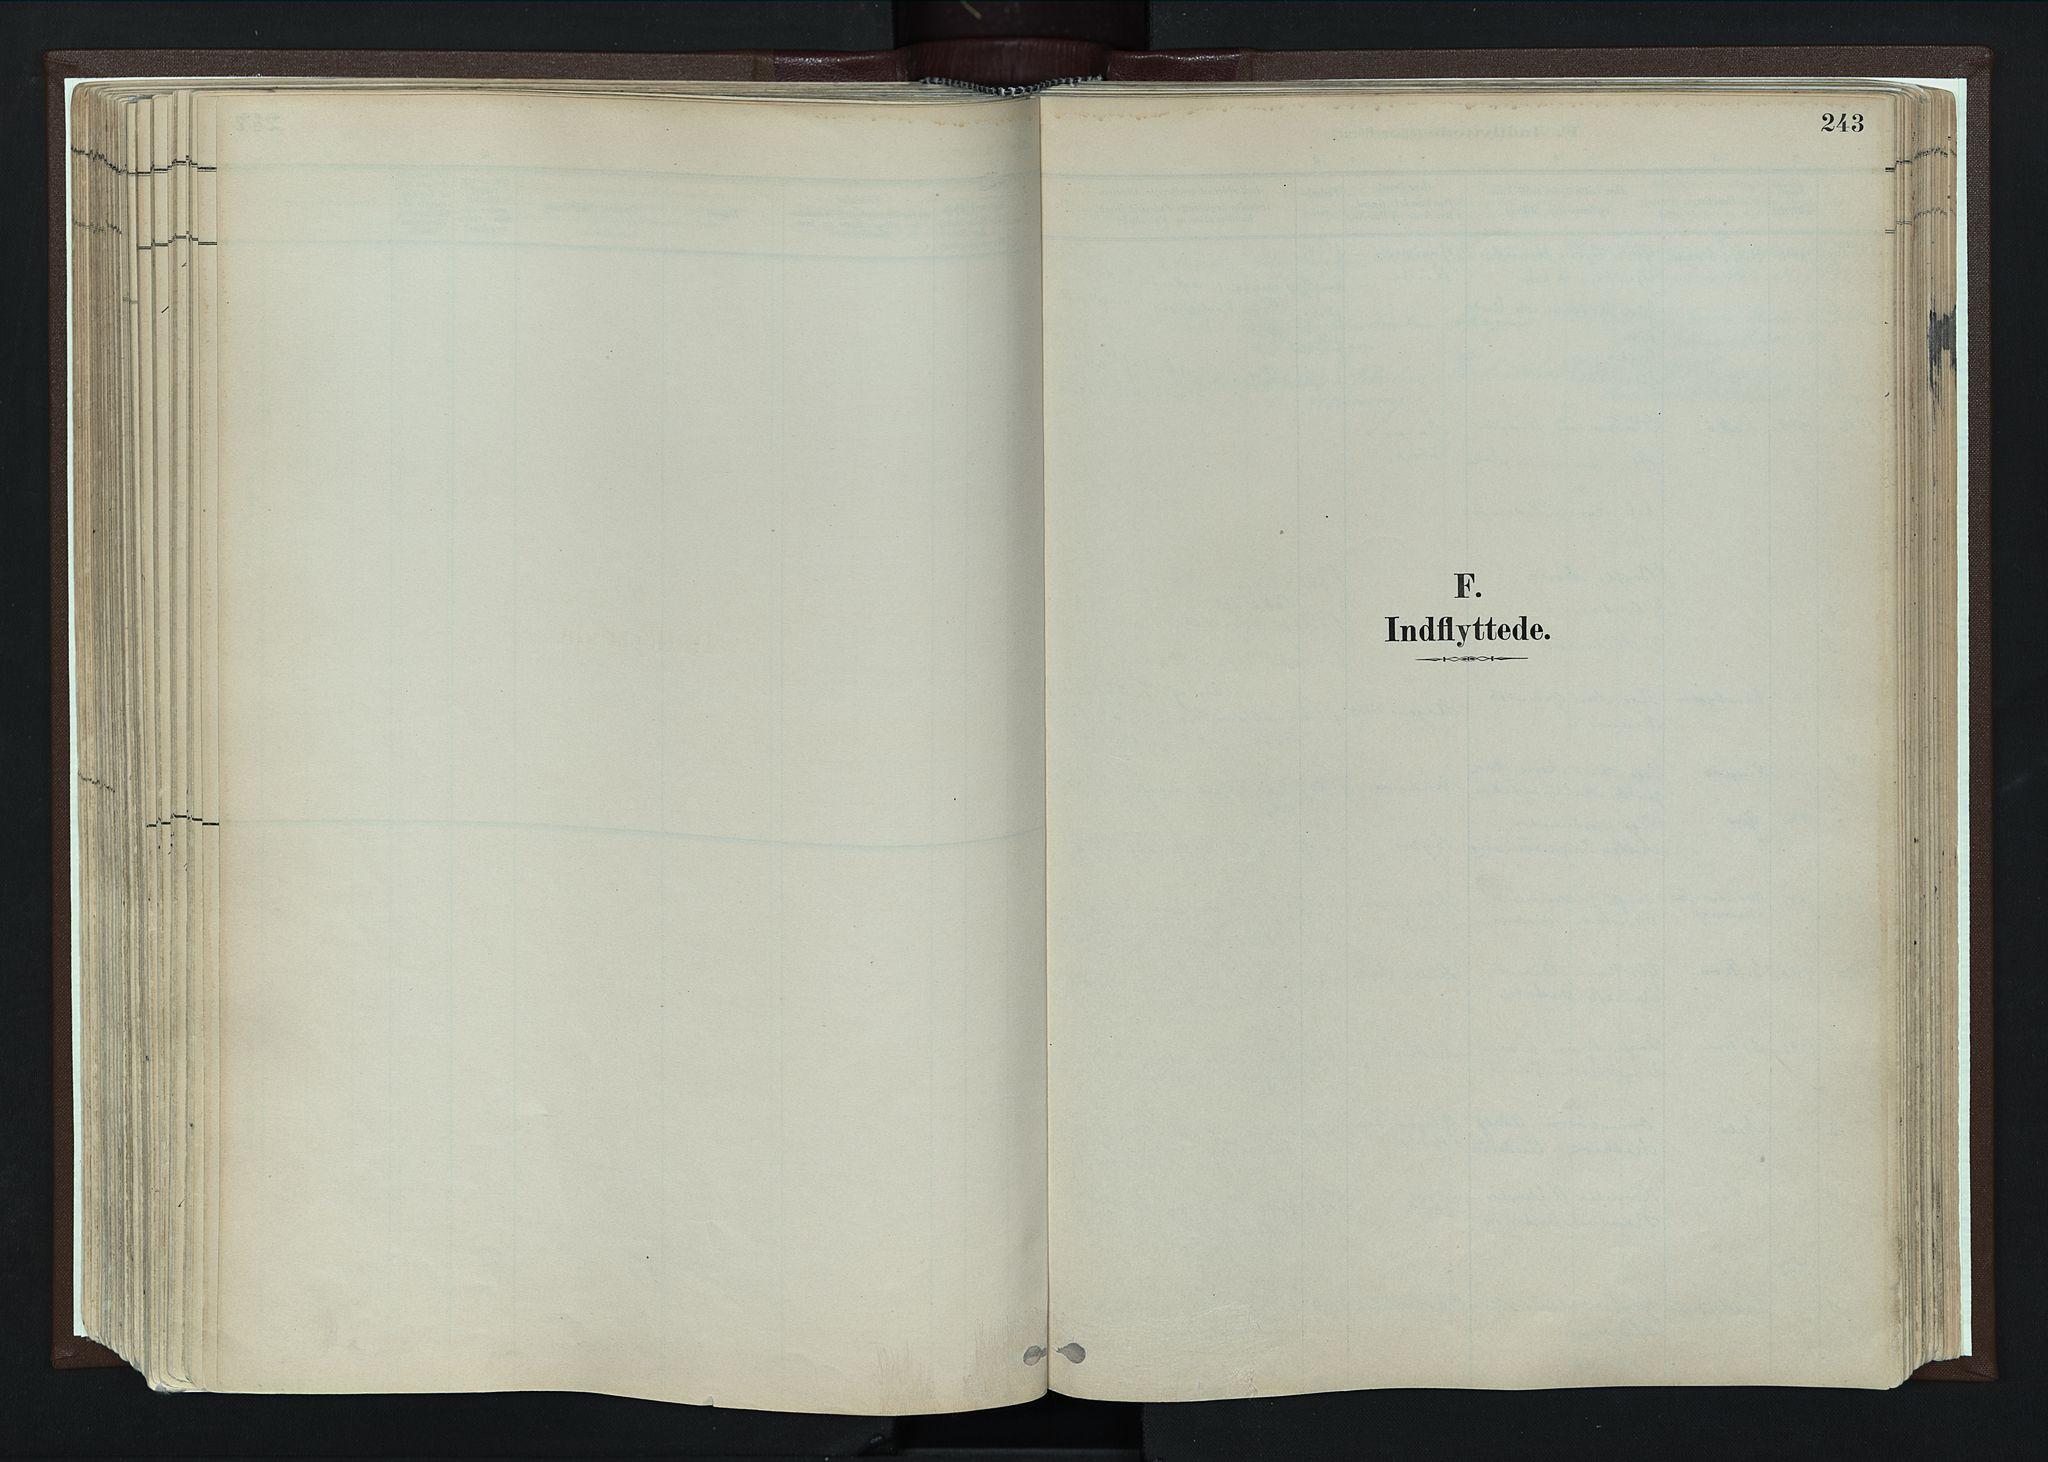 SAH, Nord-Fron prestekontor, Parish register (official) no. 4, 1884-1914, p. 243